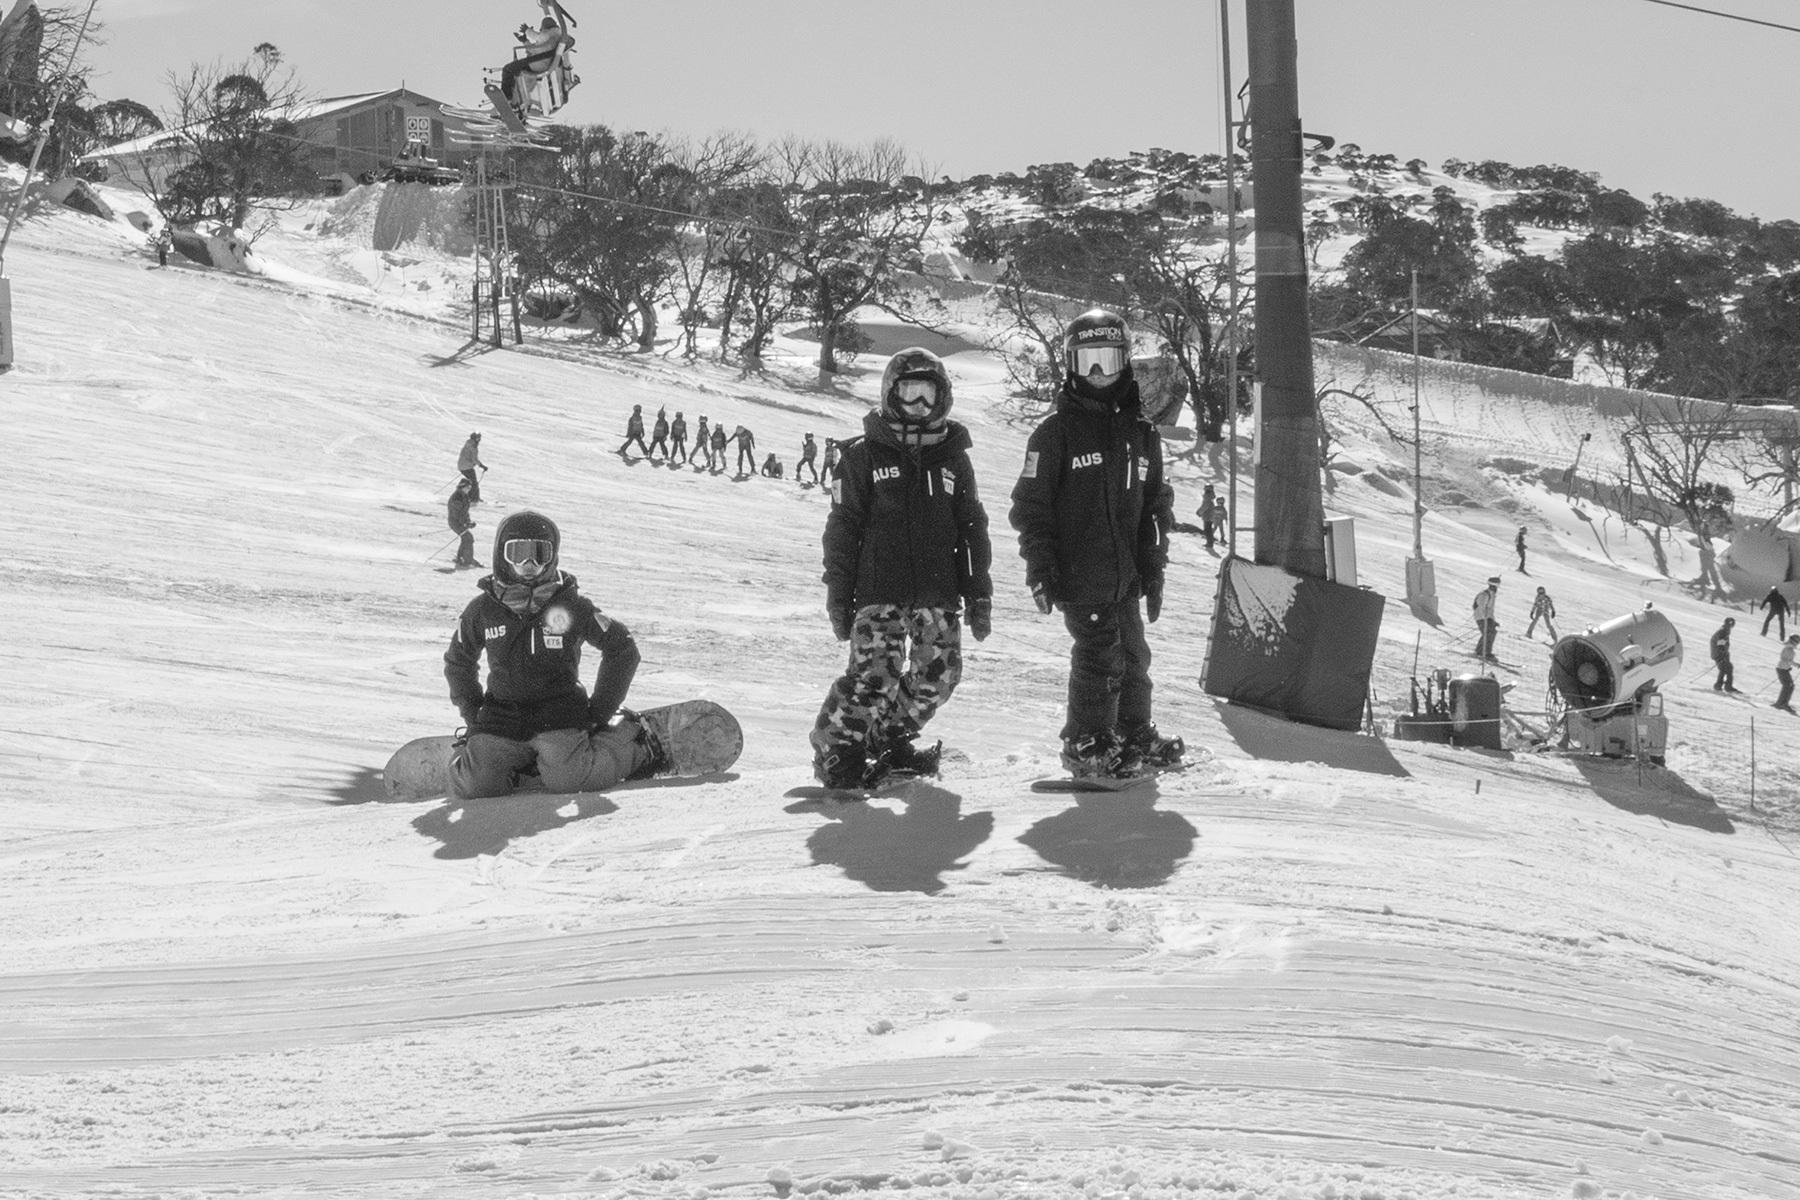 The future of Australian snowboarding